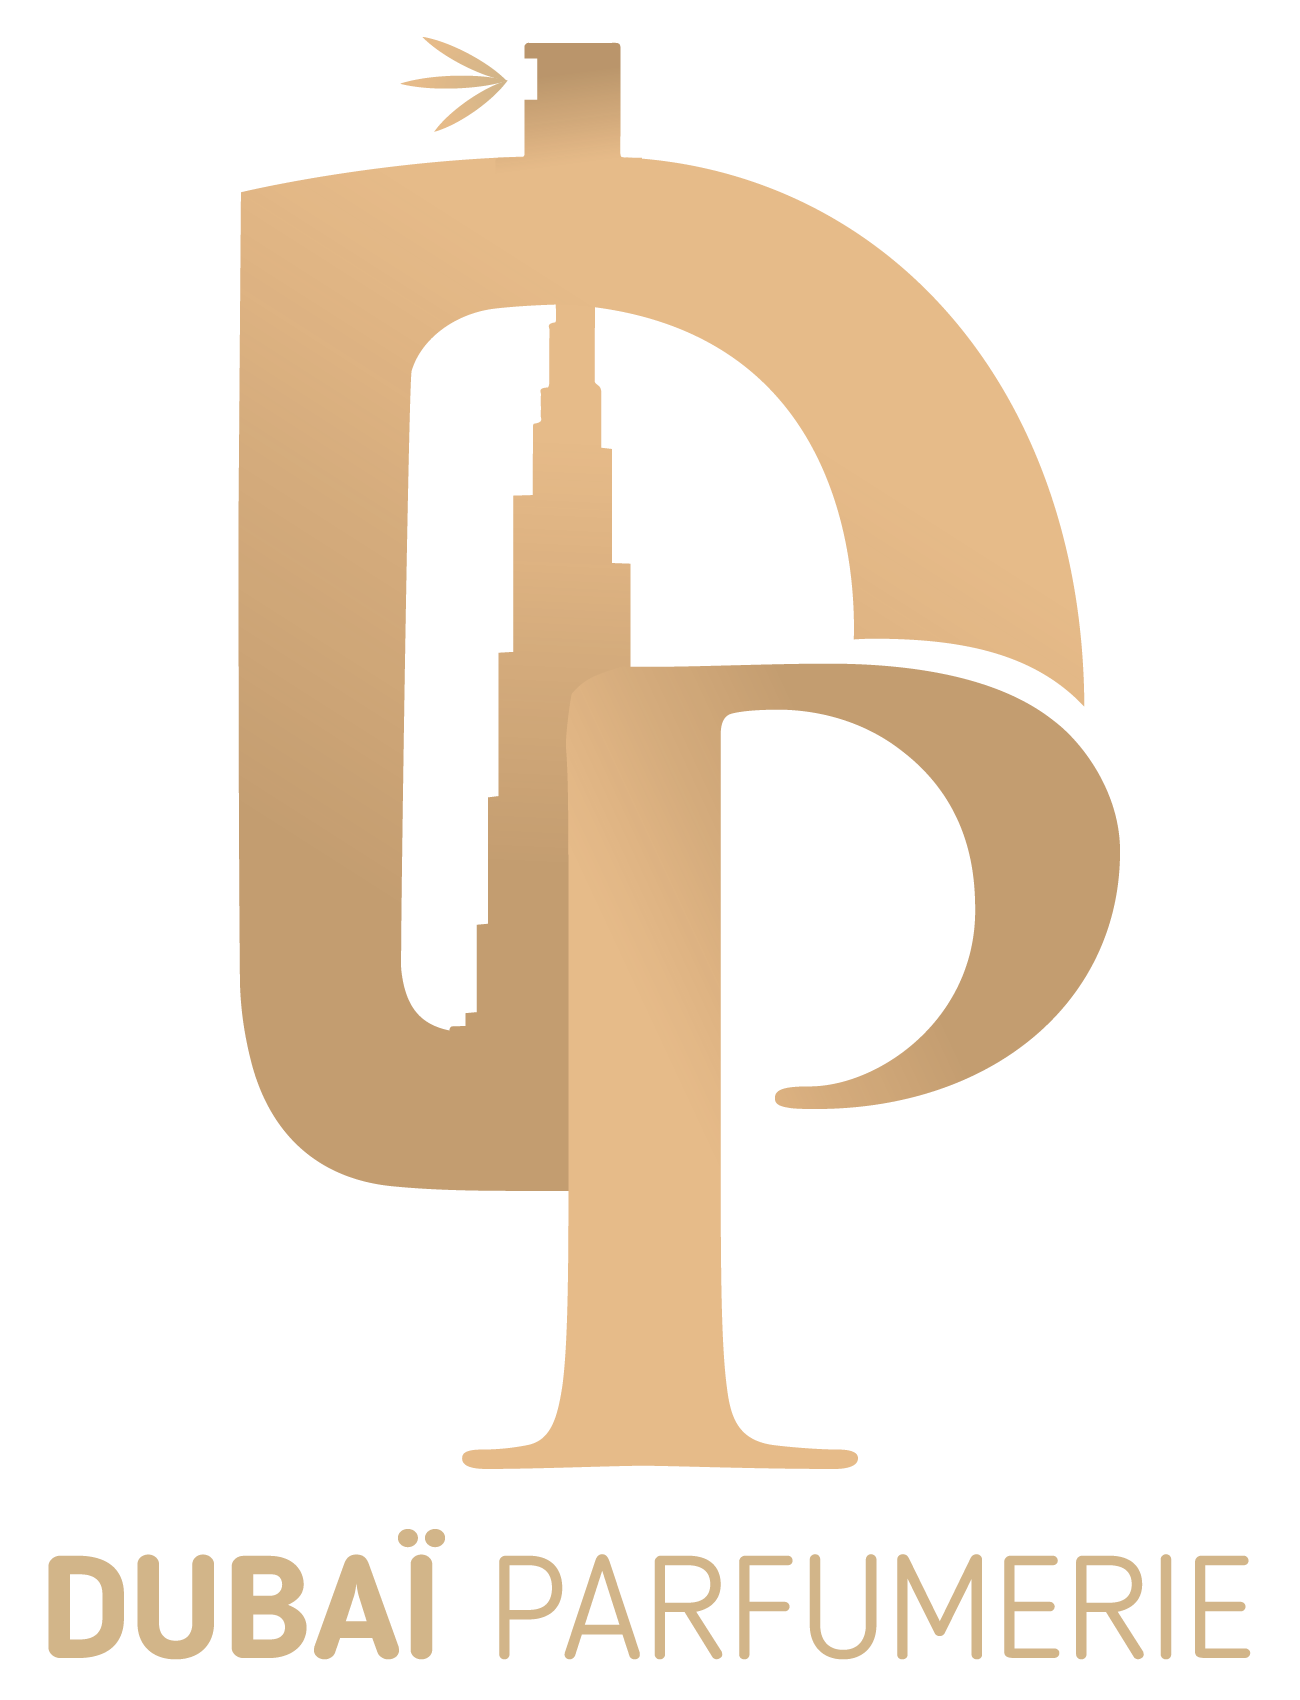 Dubai Parfumerie